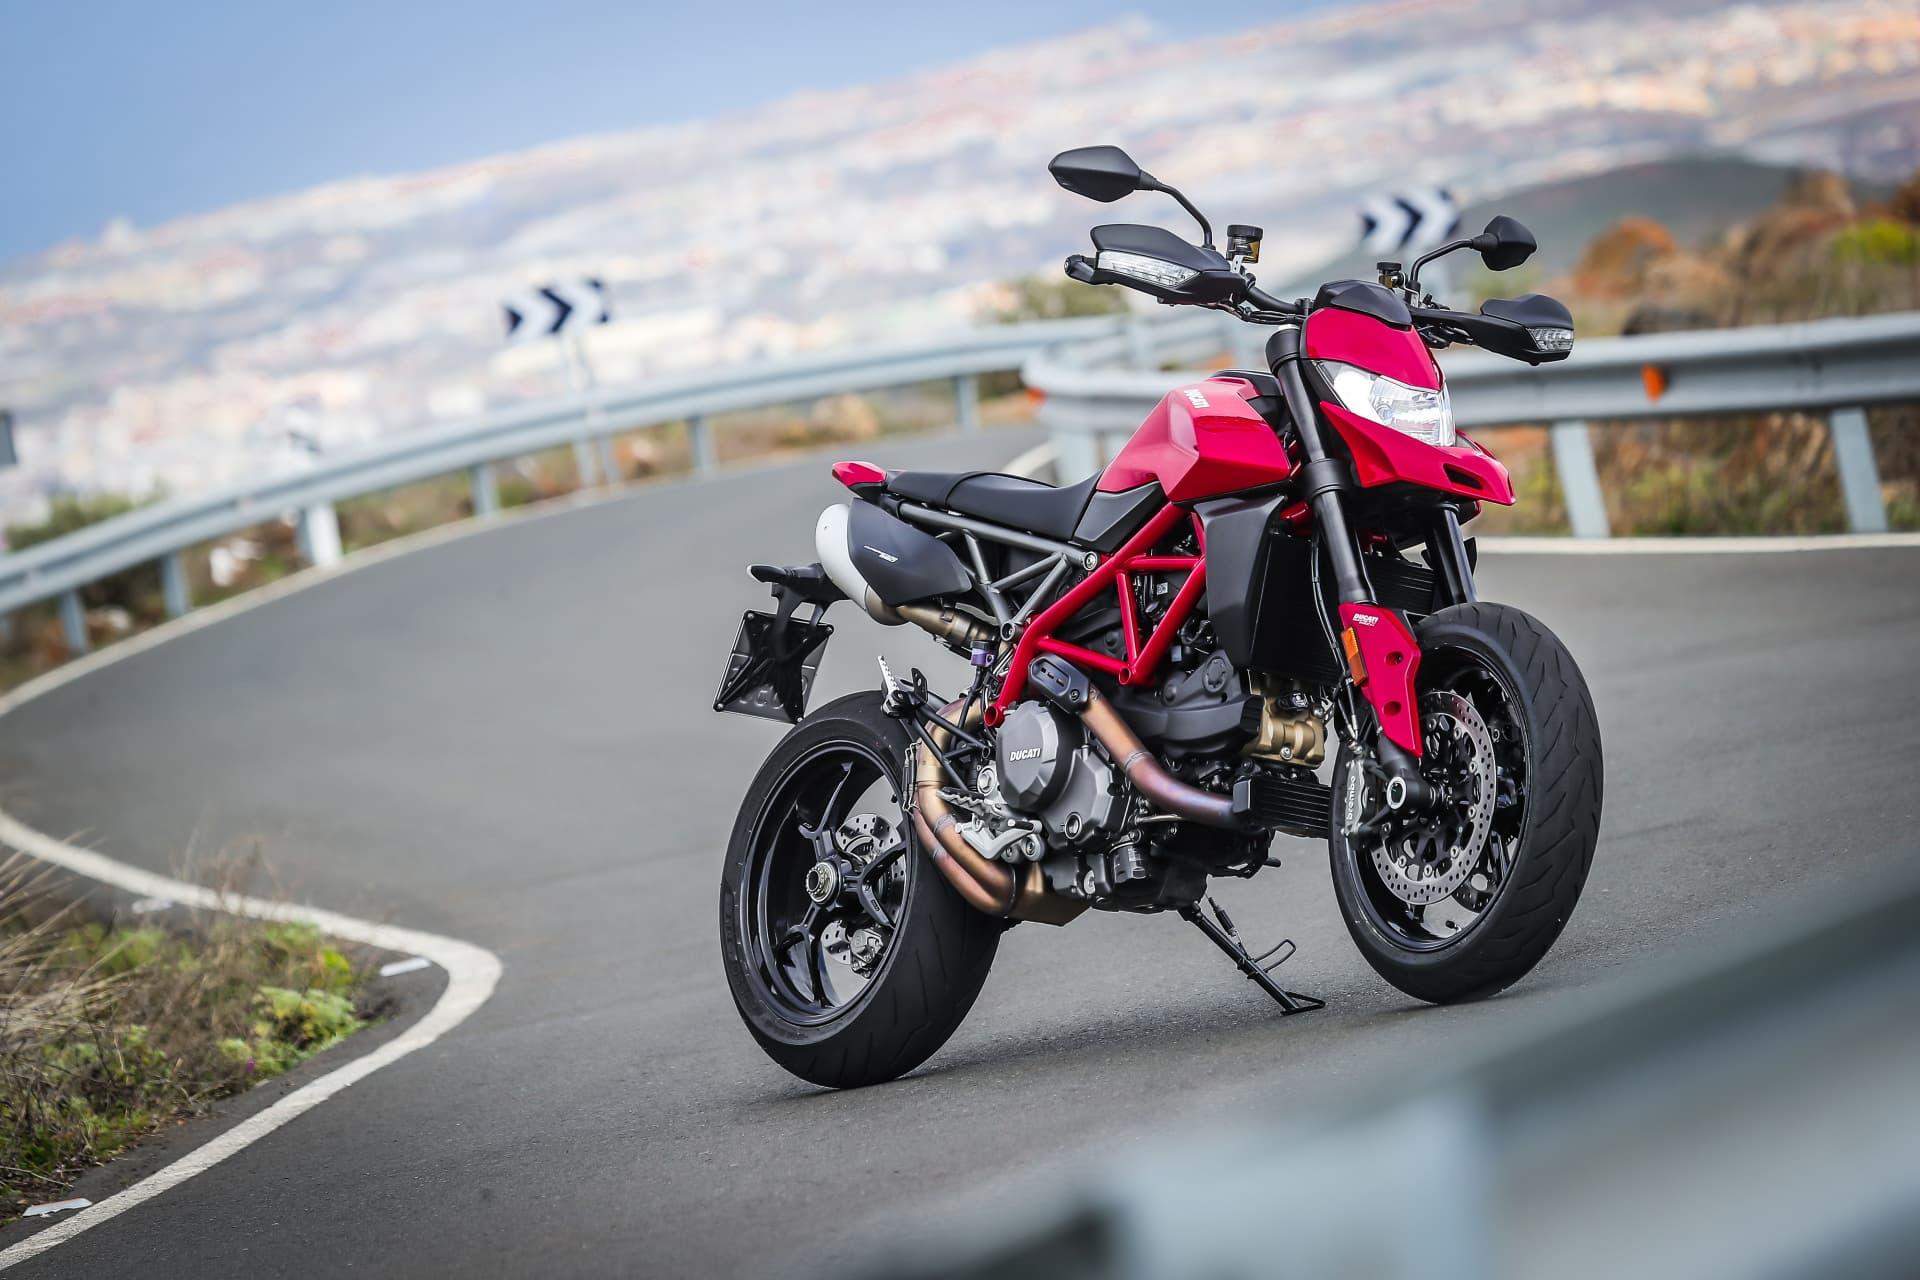 Ducati Hypermotard 950 Static 07 Uc70268 Mid